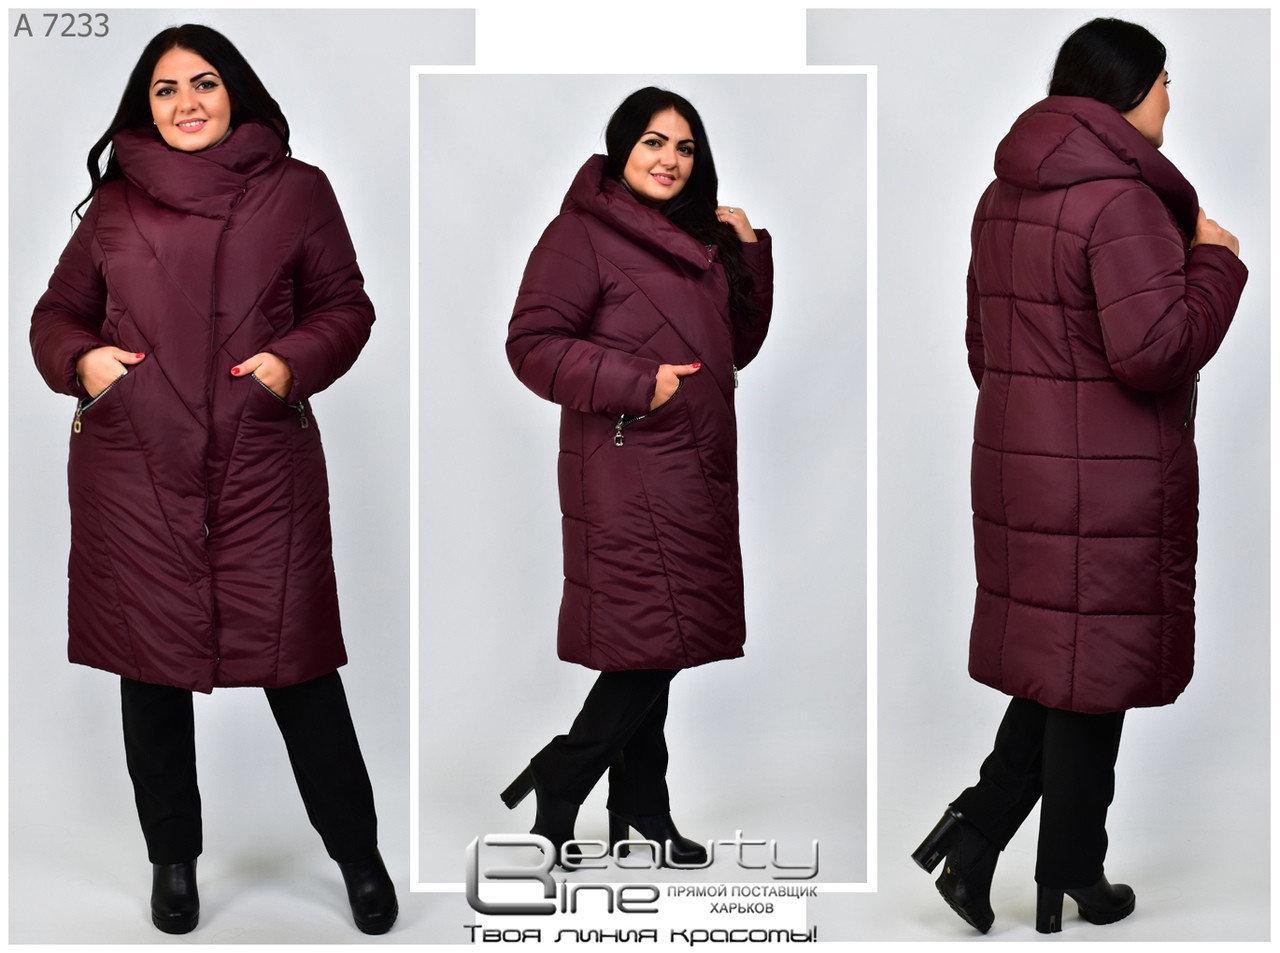 Женская зимняя куртка Размеры 52.54.56.58